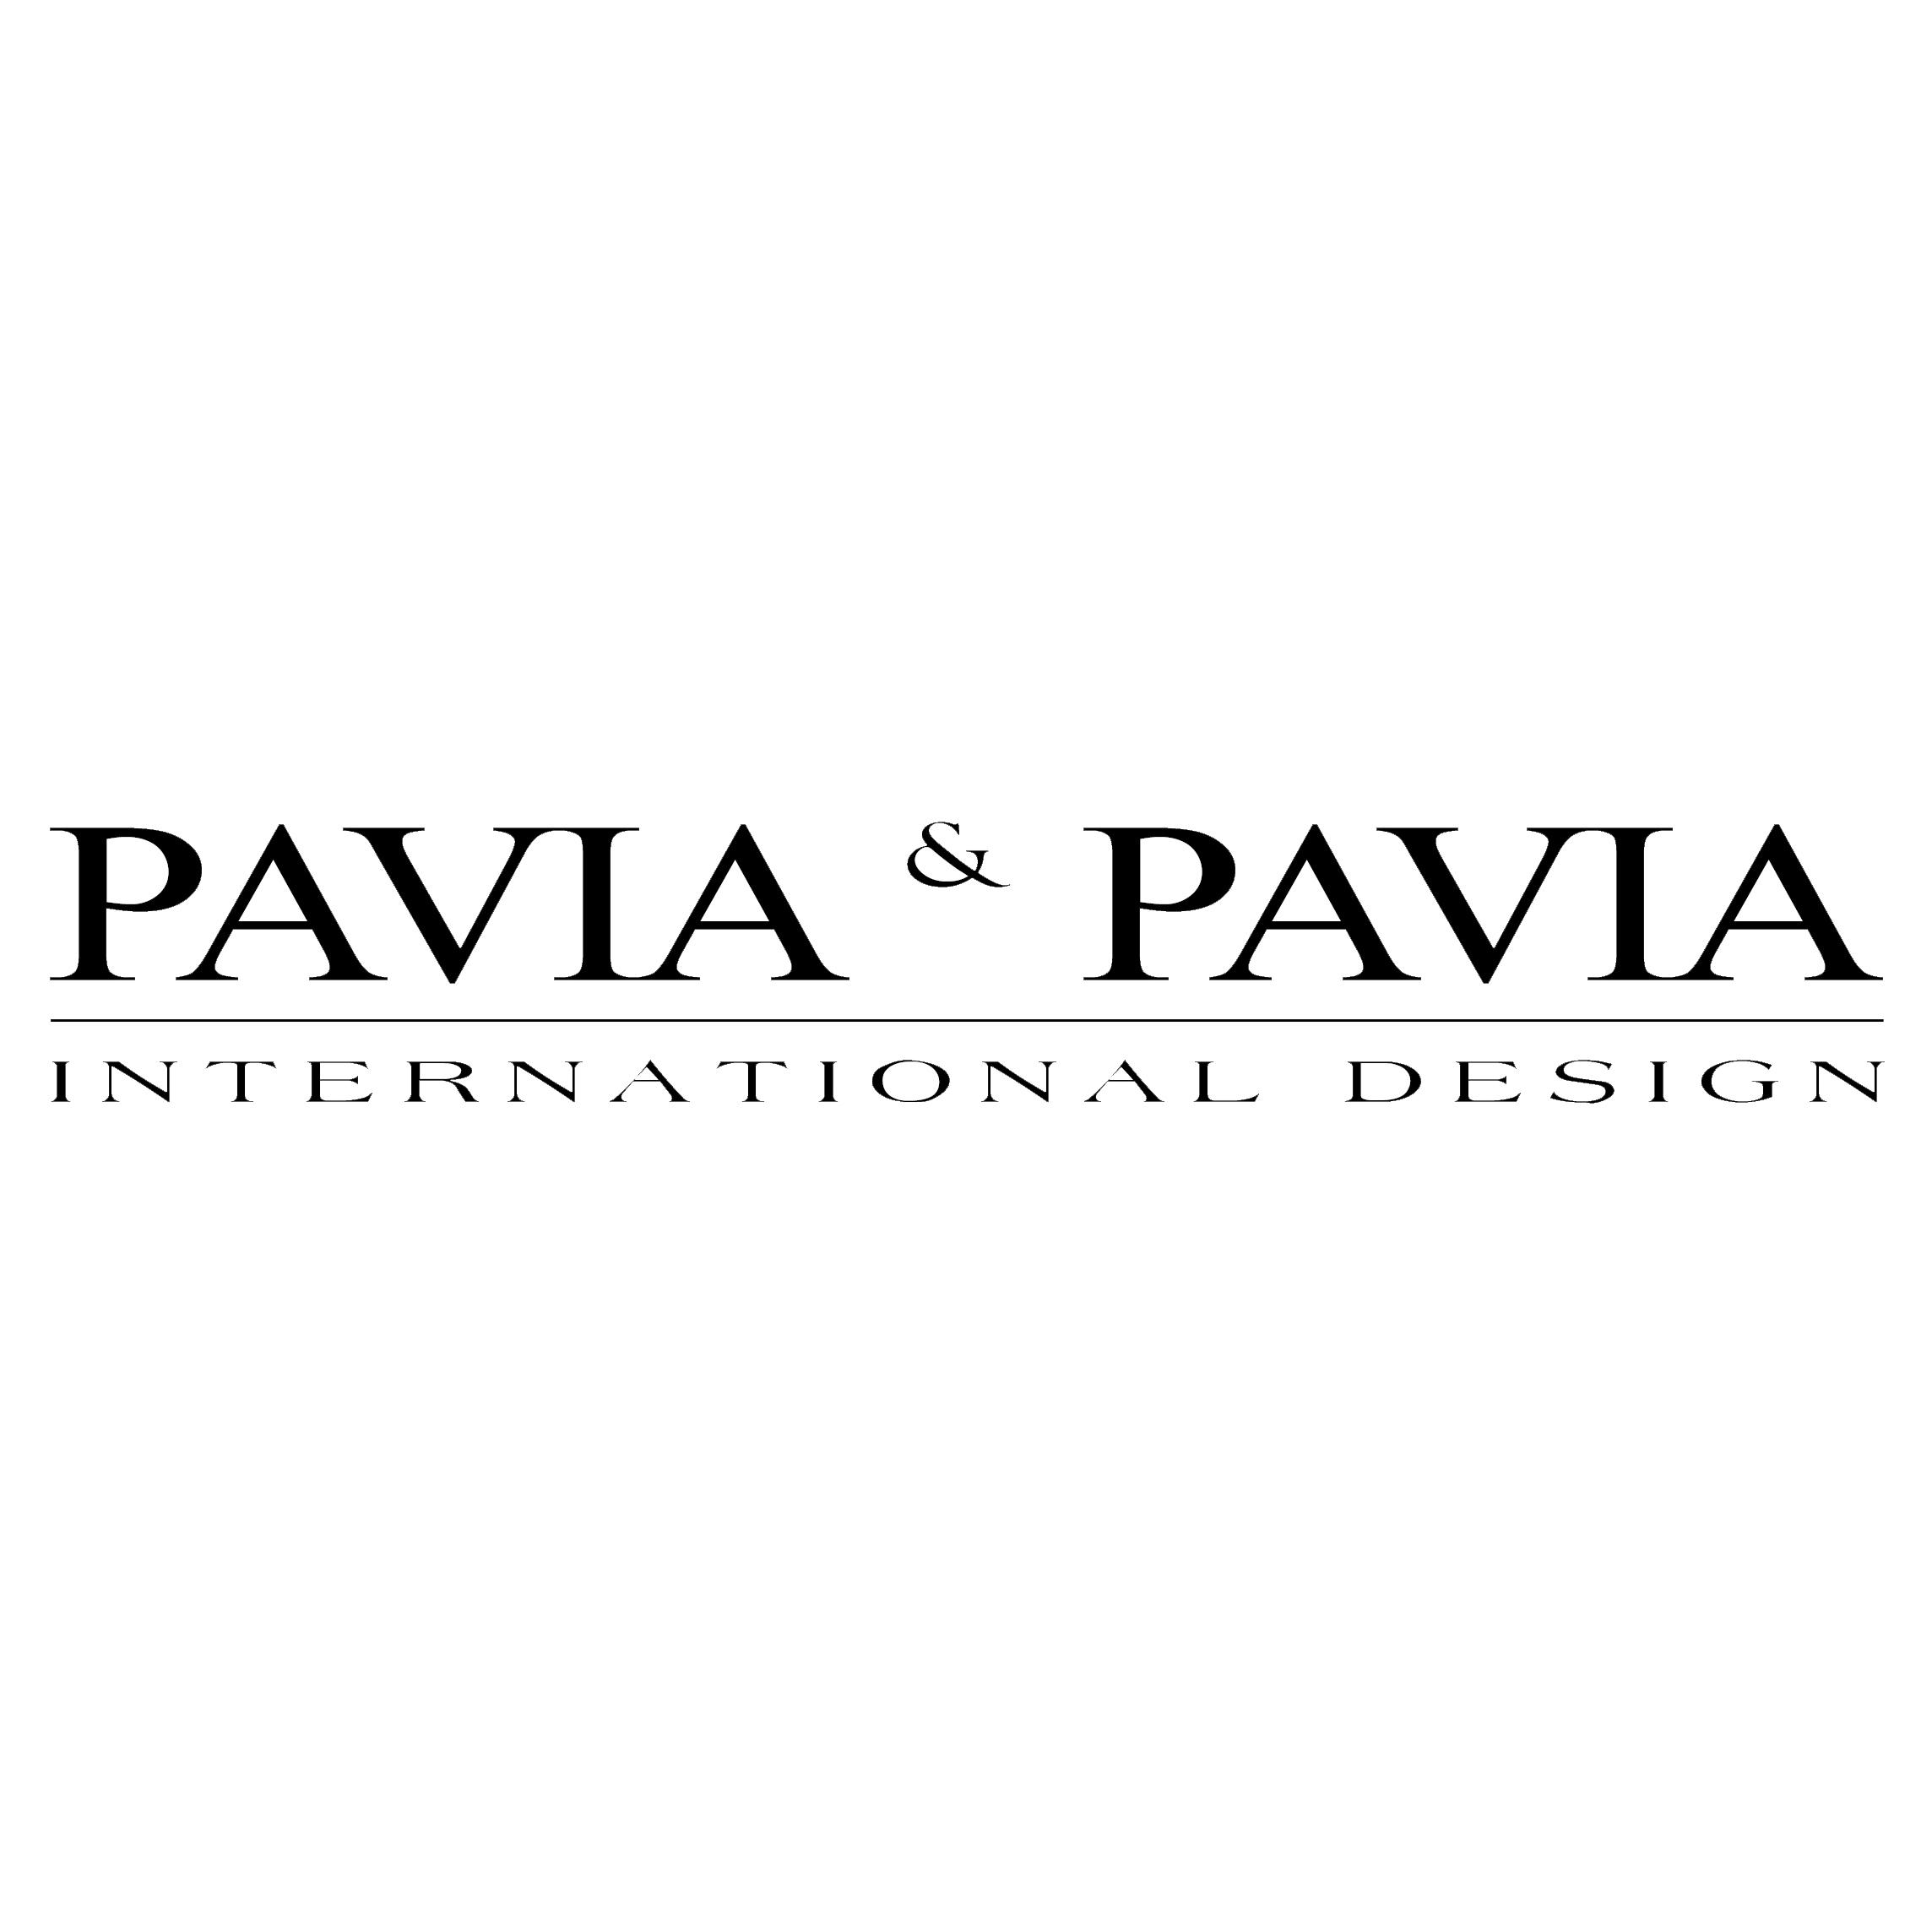 Pavia & Pavia International Design